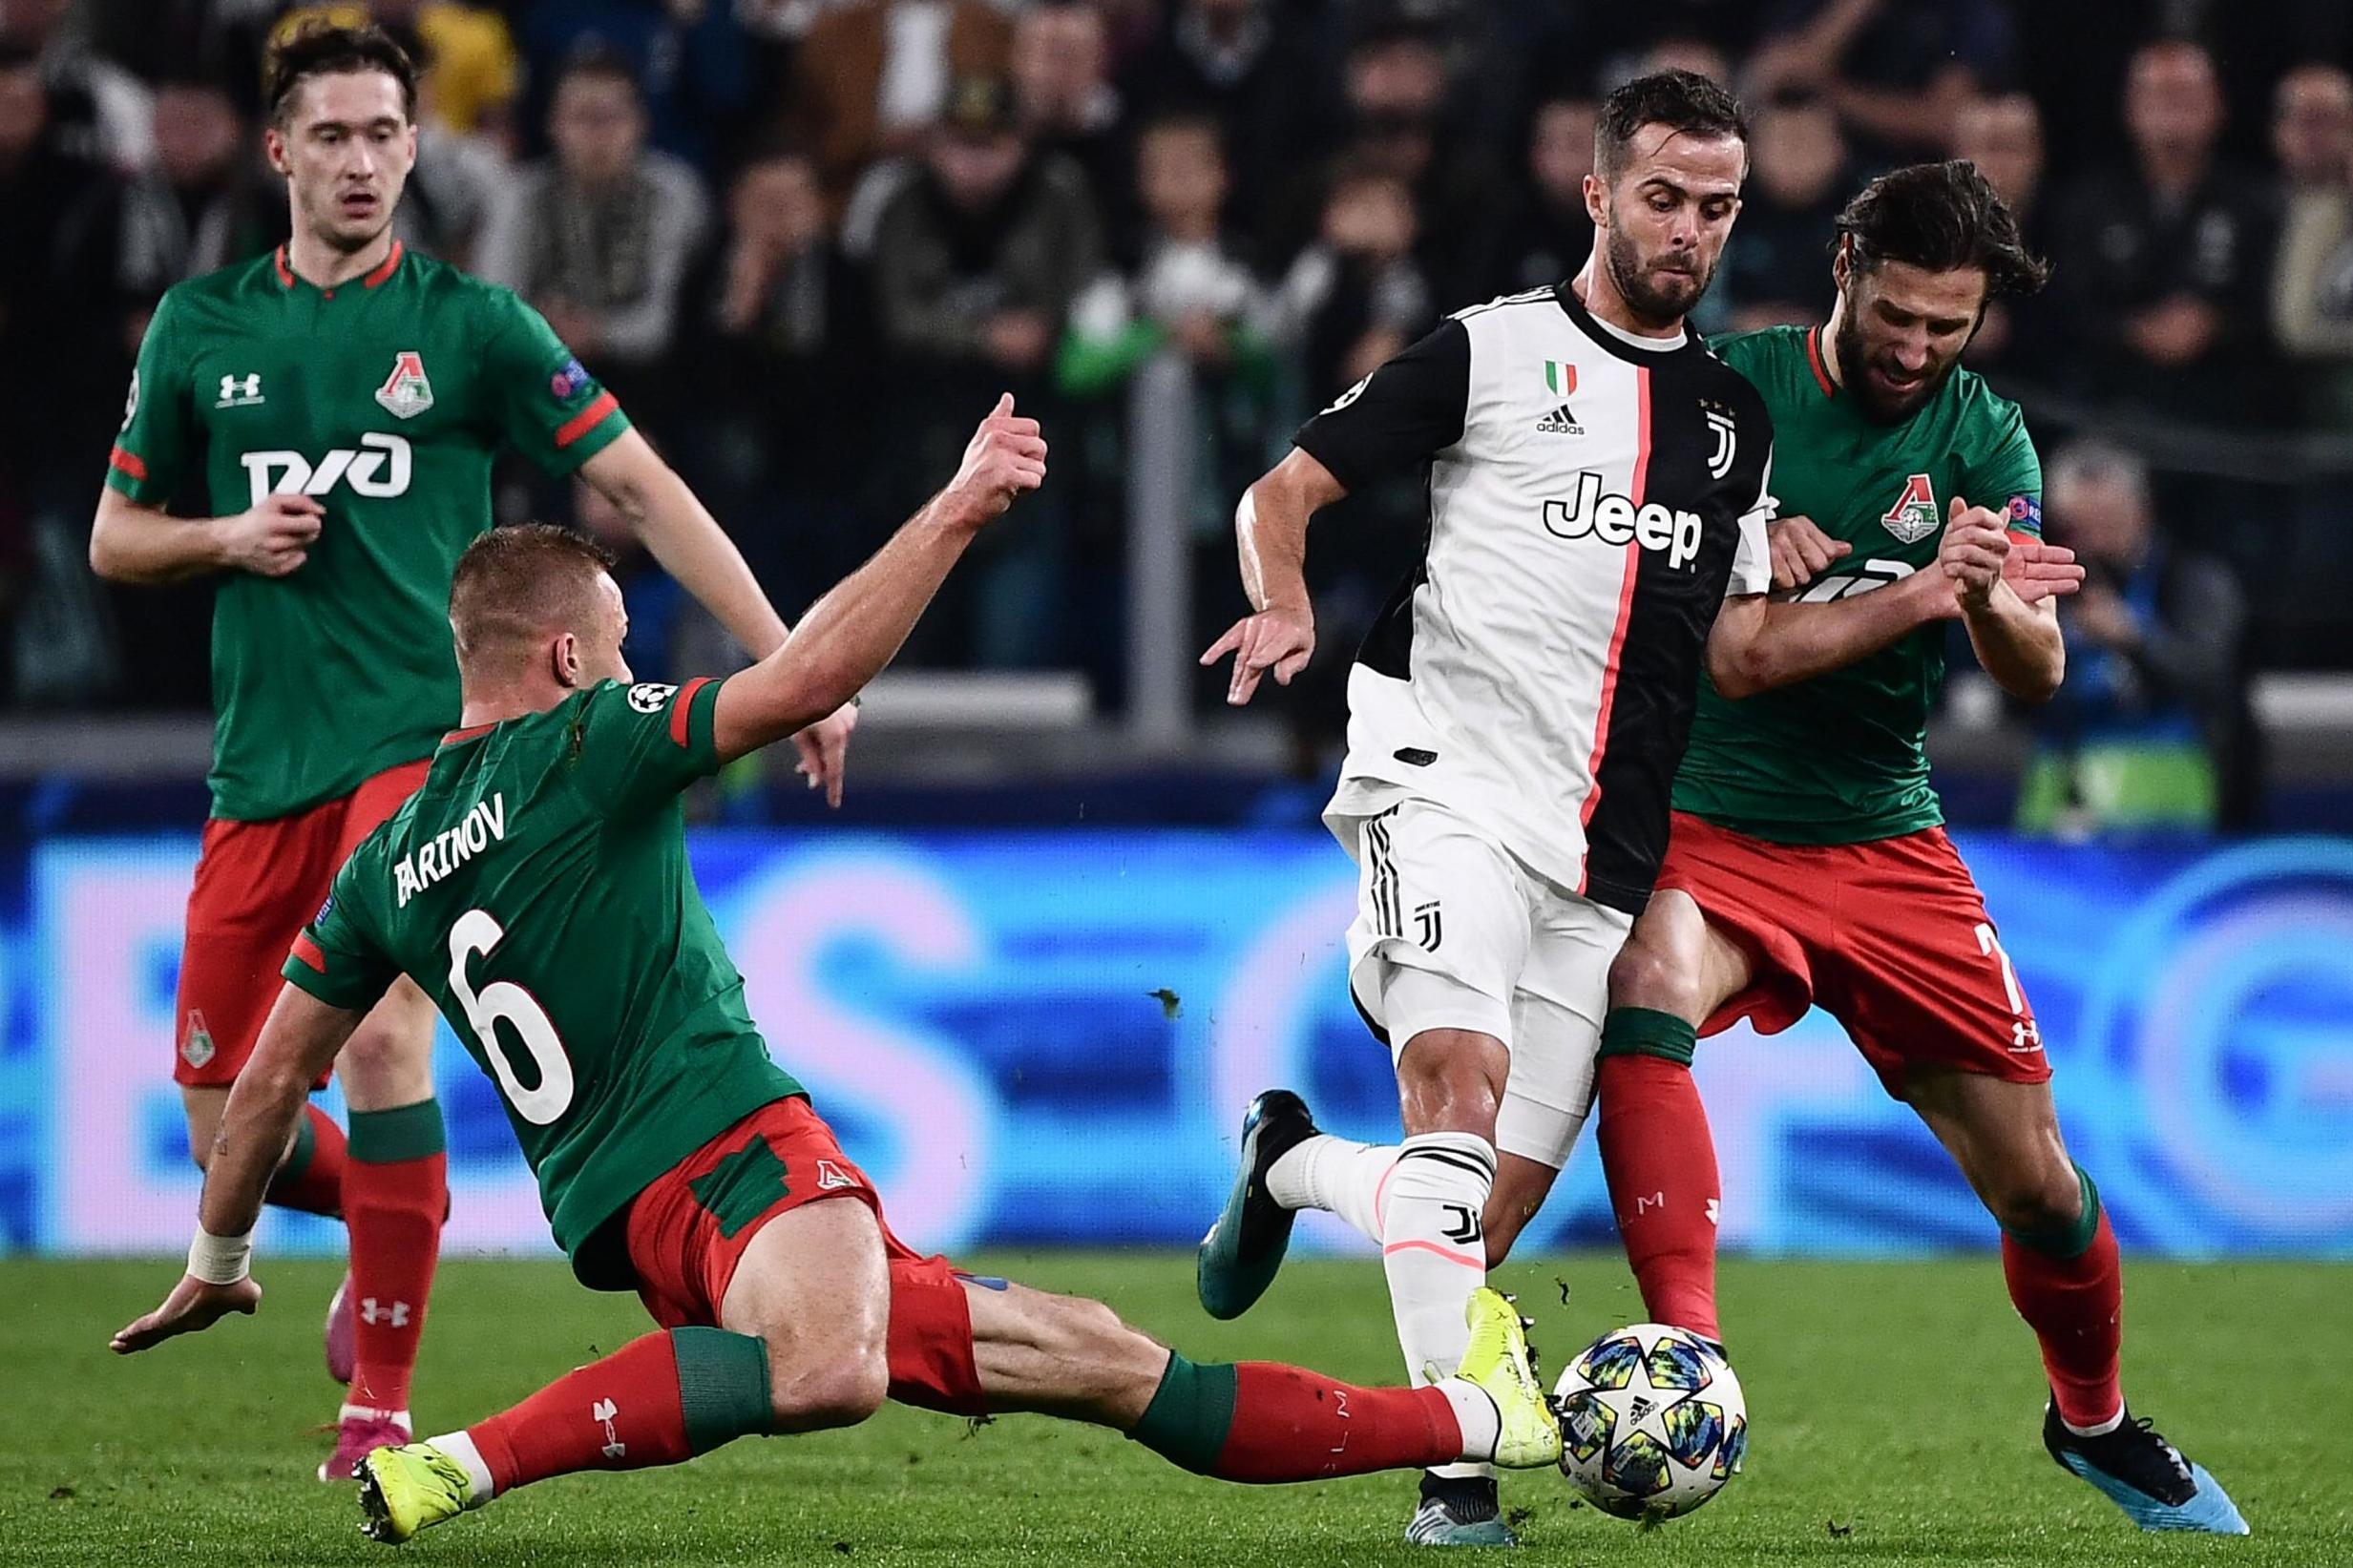 Walaupun Bermain All Out, Belum Cukup Untuk Taklukkan Juventus - 2